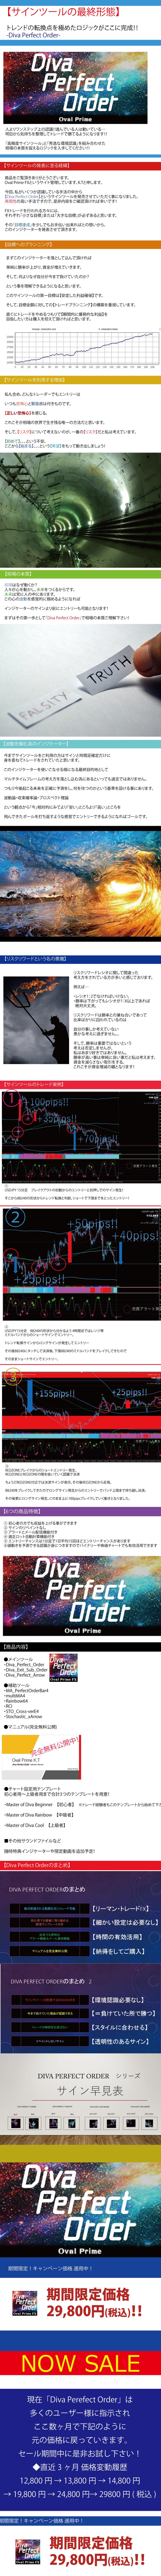 Diva-Perfect-Order-LP-Master1.jpg